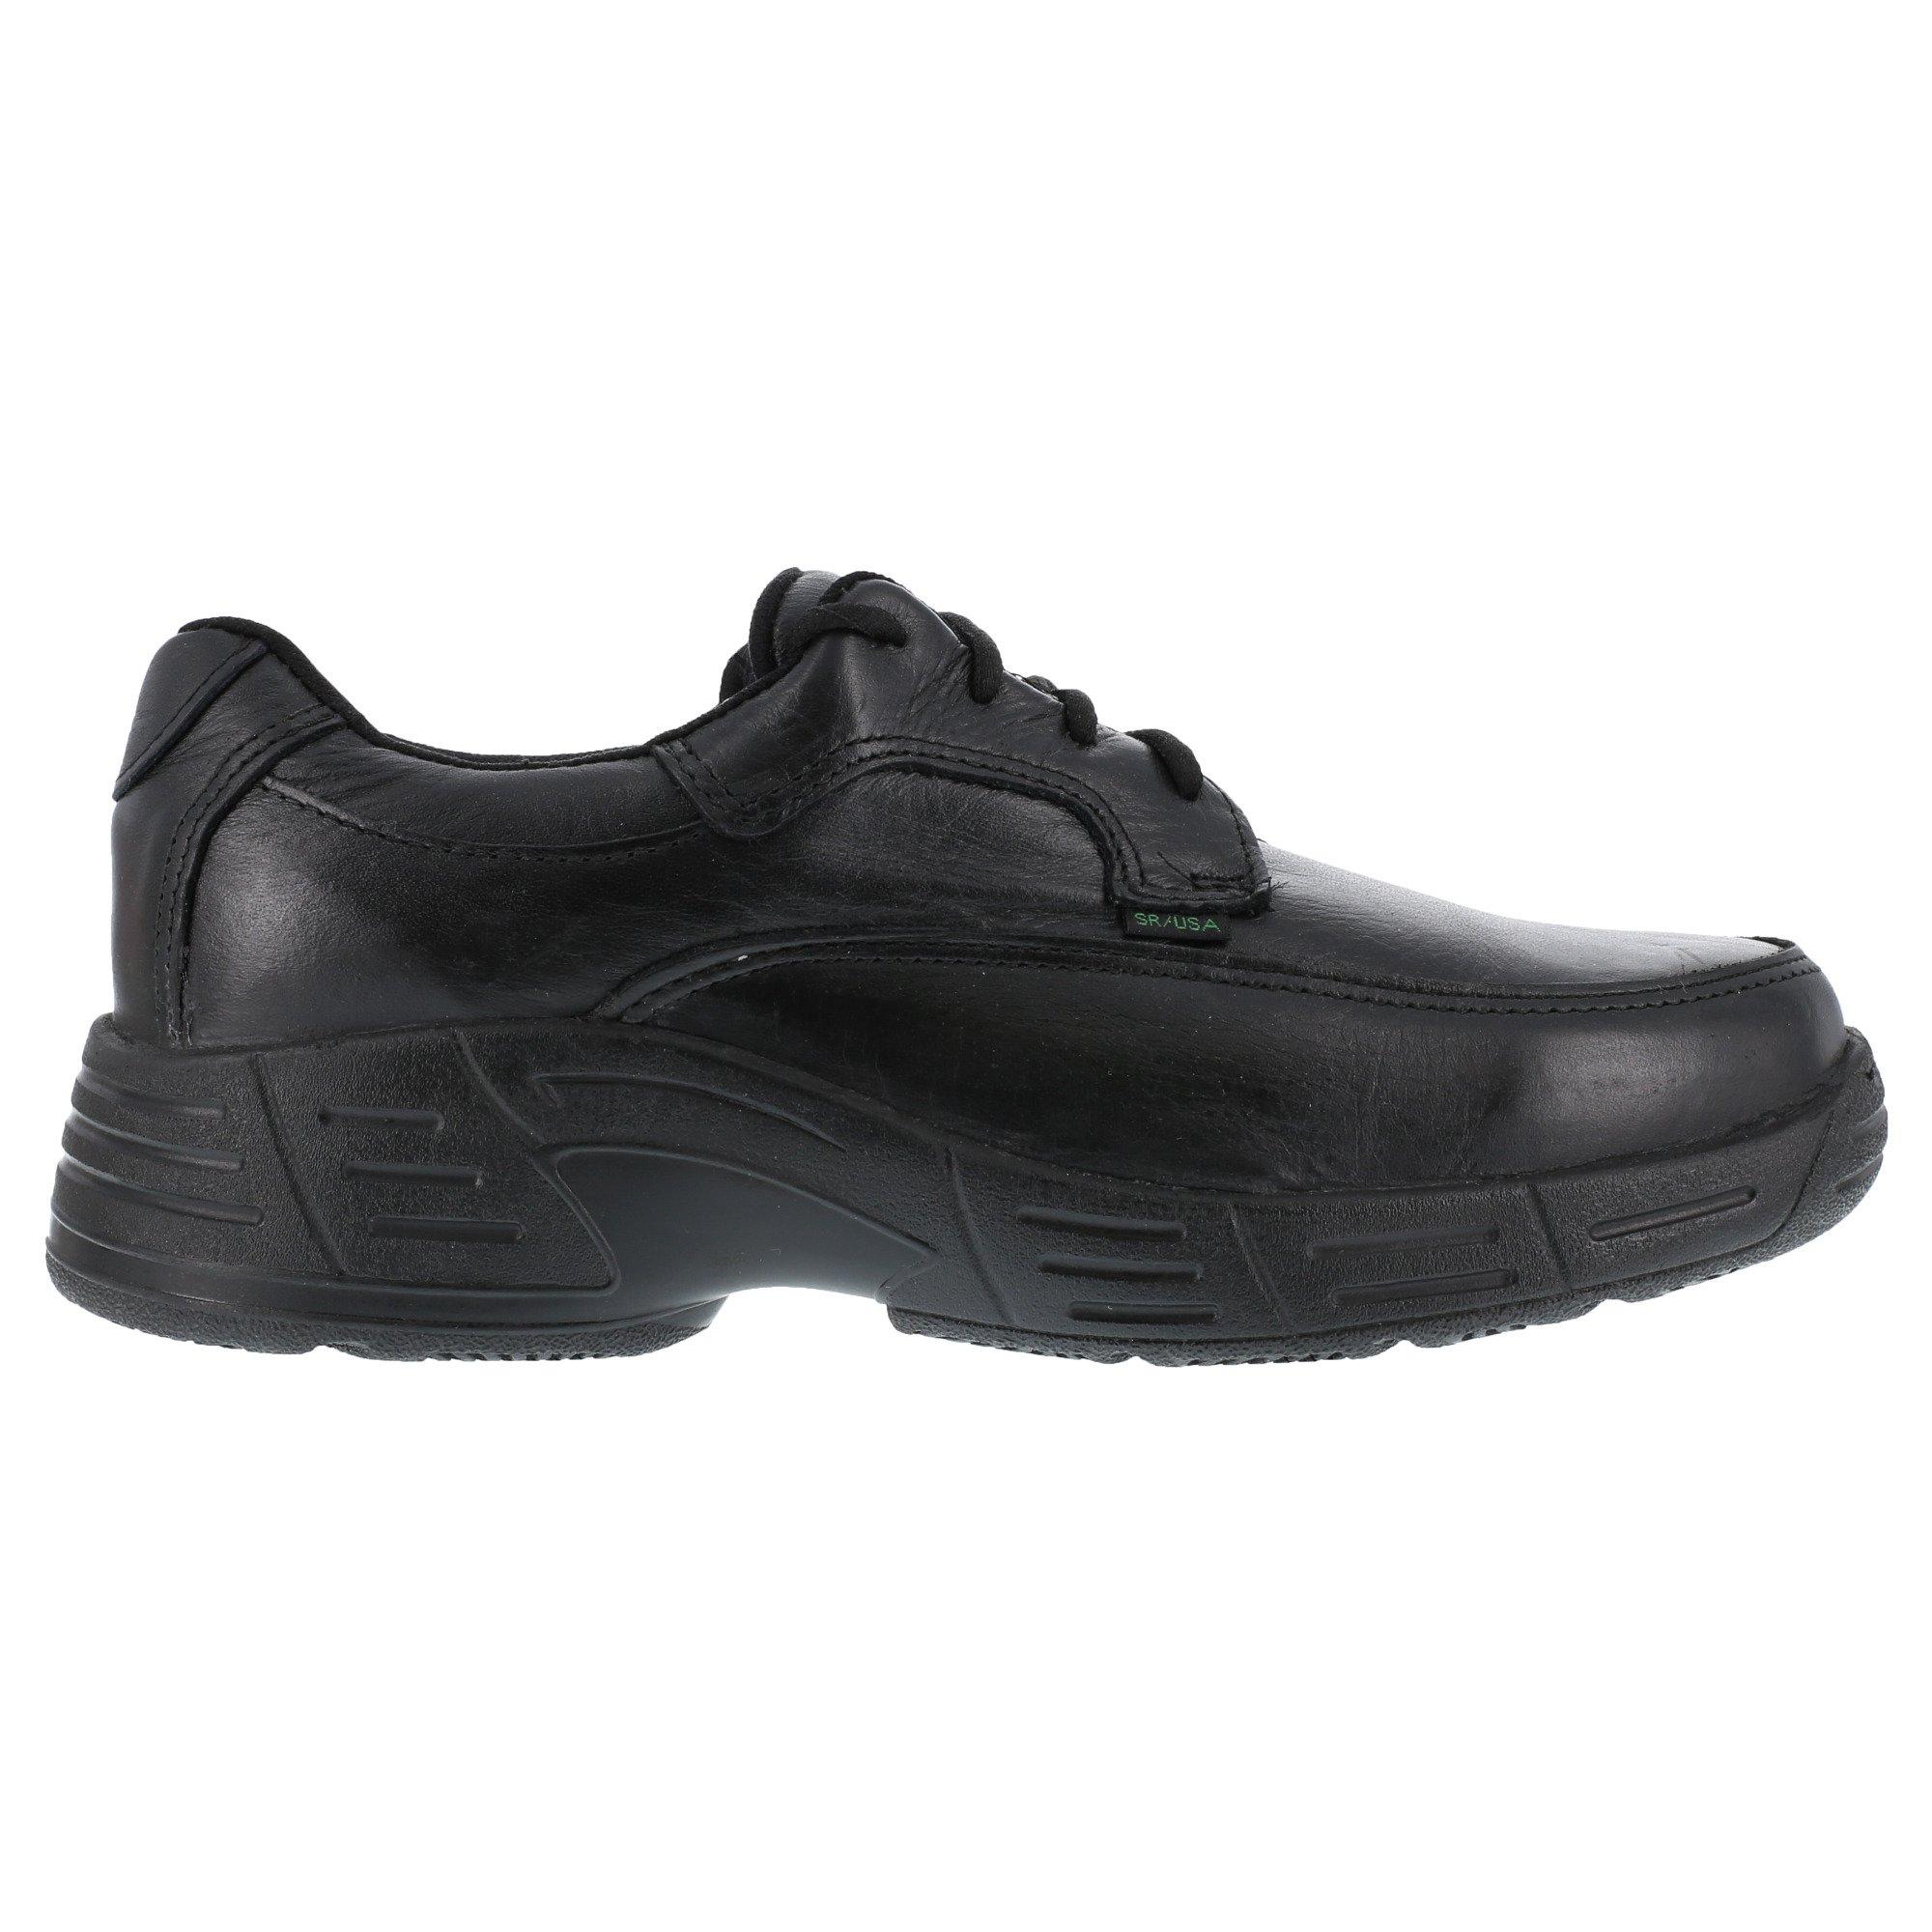 Florsheim Womens Black Leather Work Shoes Postal Classic Oxfords 11.5 M